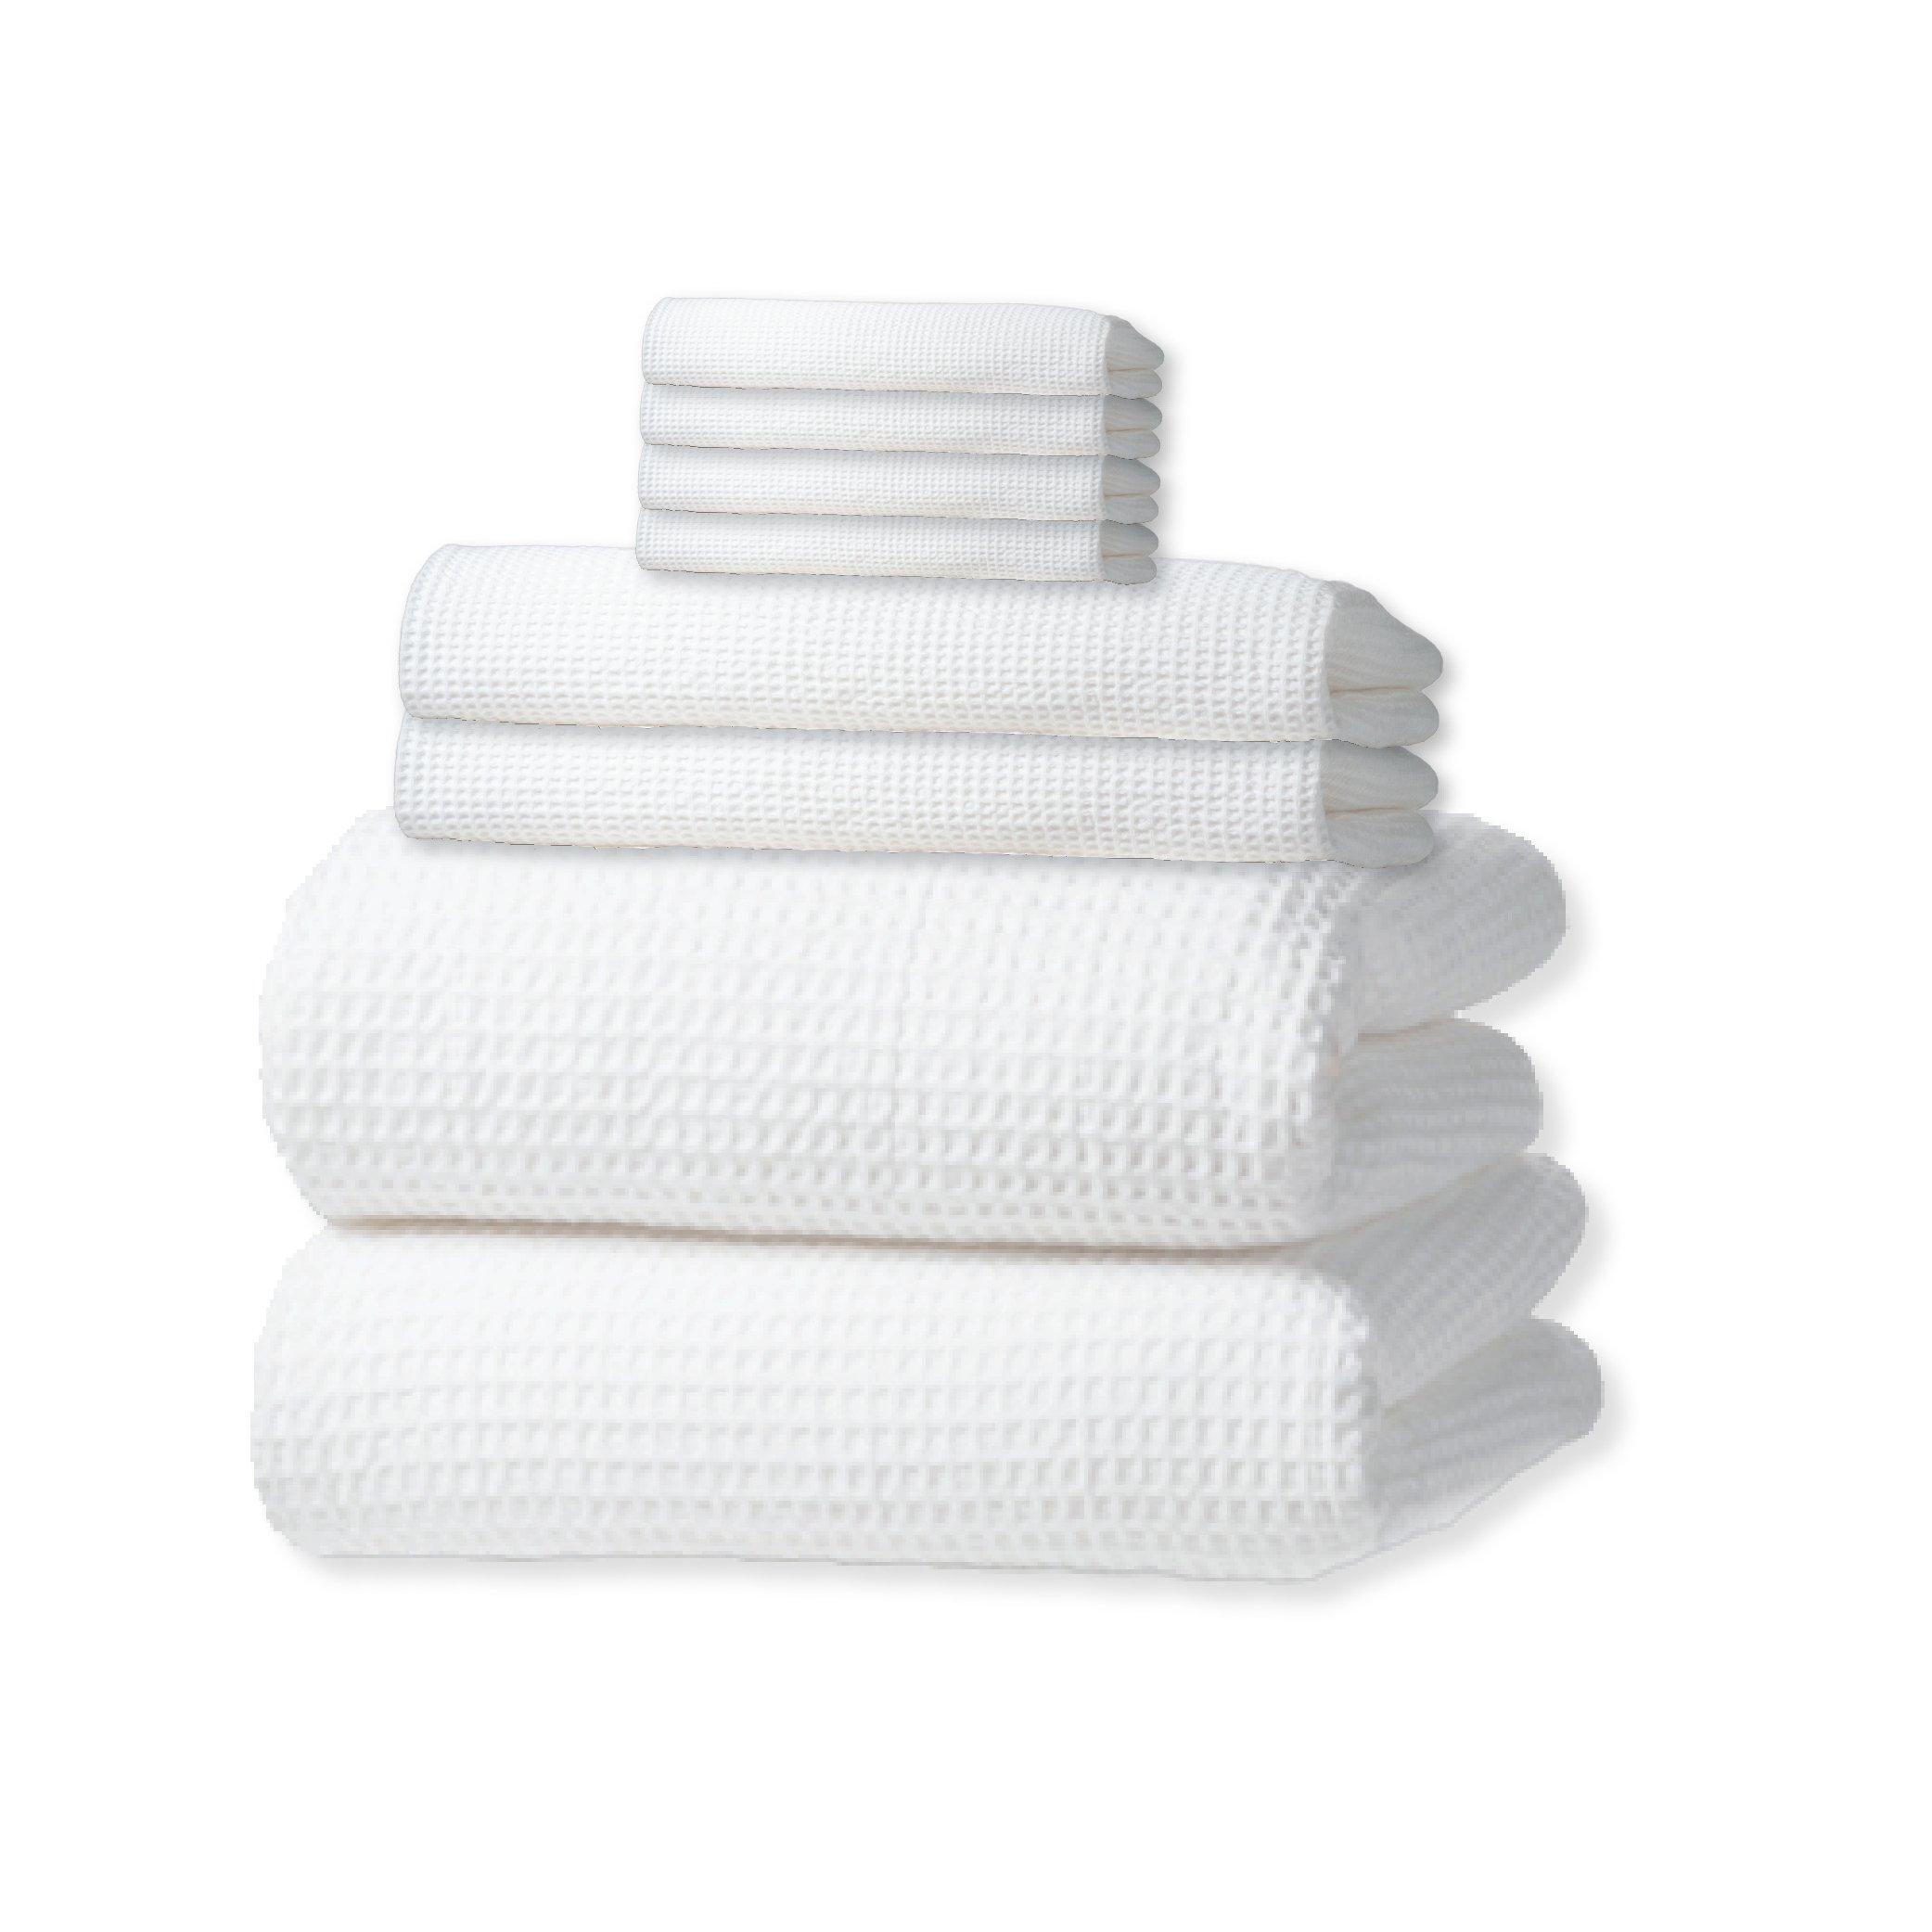 Waffle Weave Bath Towel Set with Bath Mat - Classic Style (White)